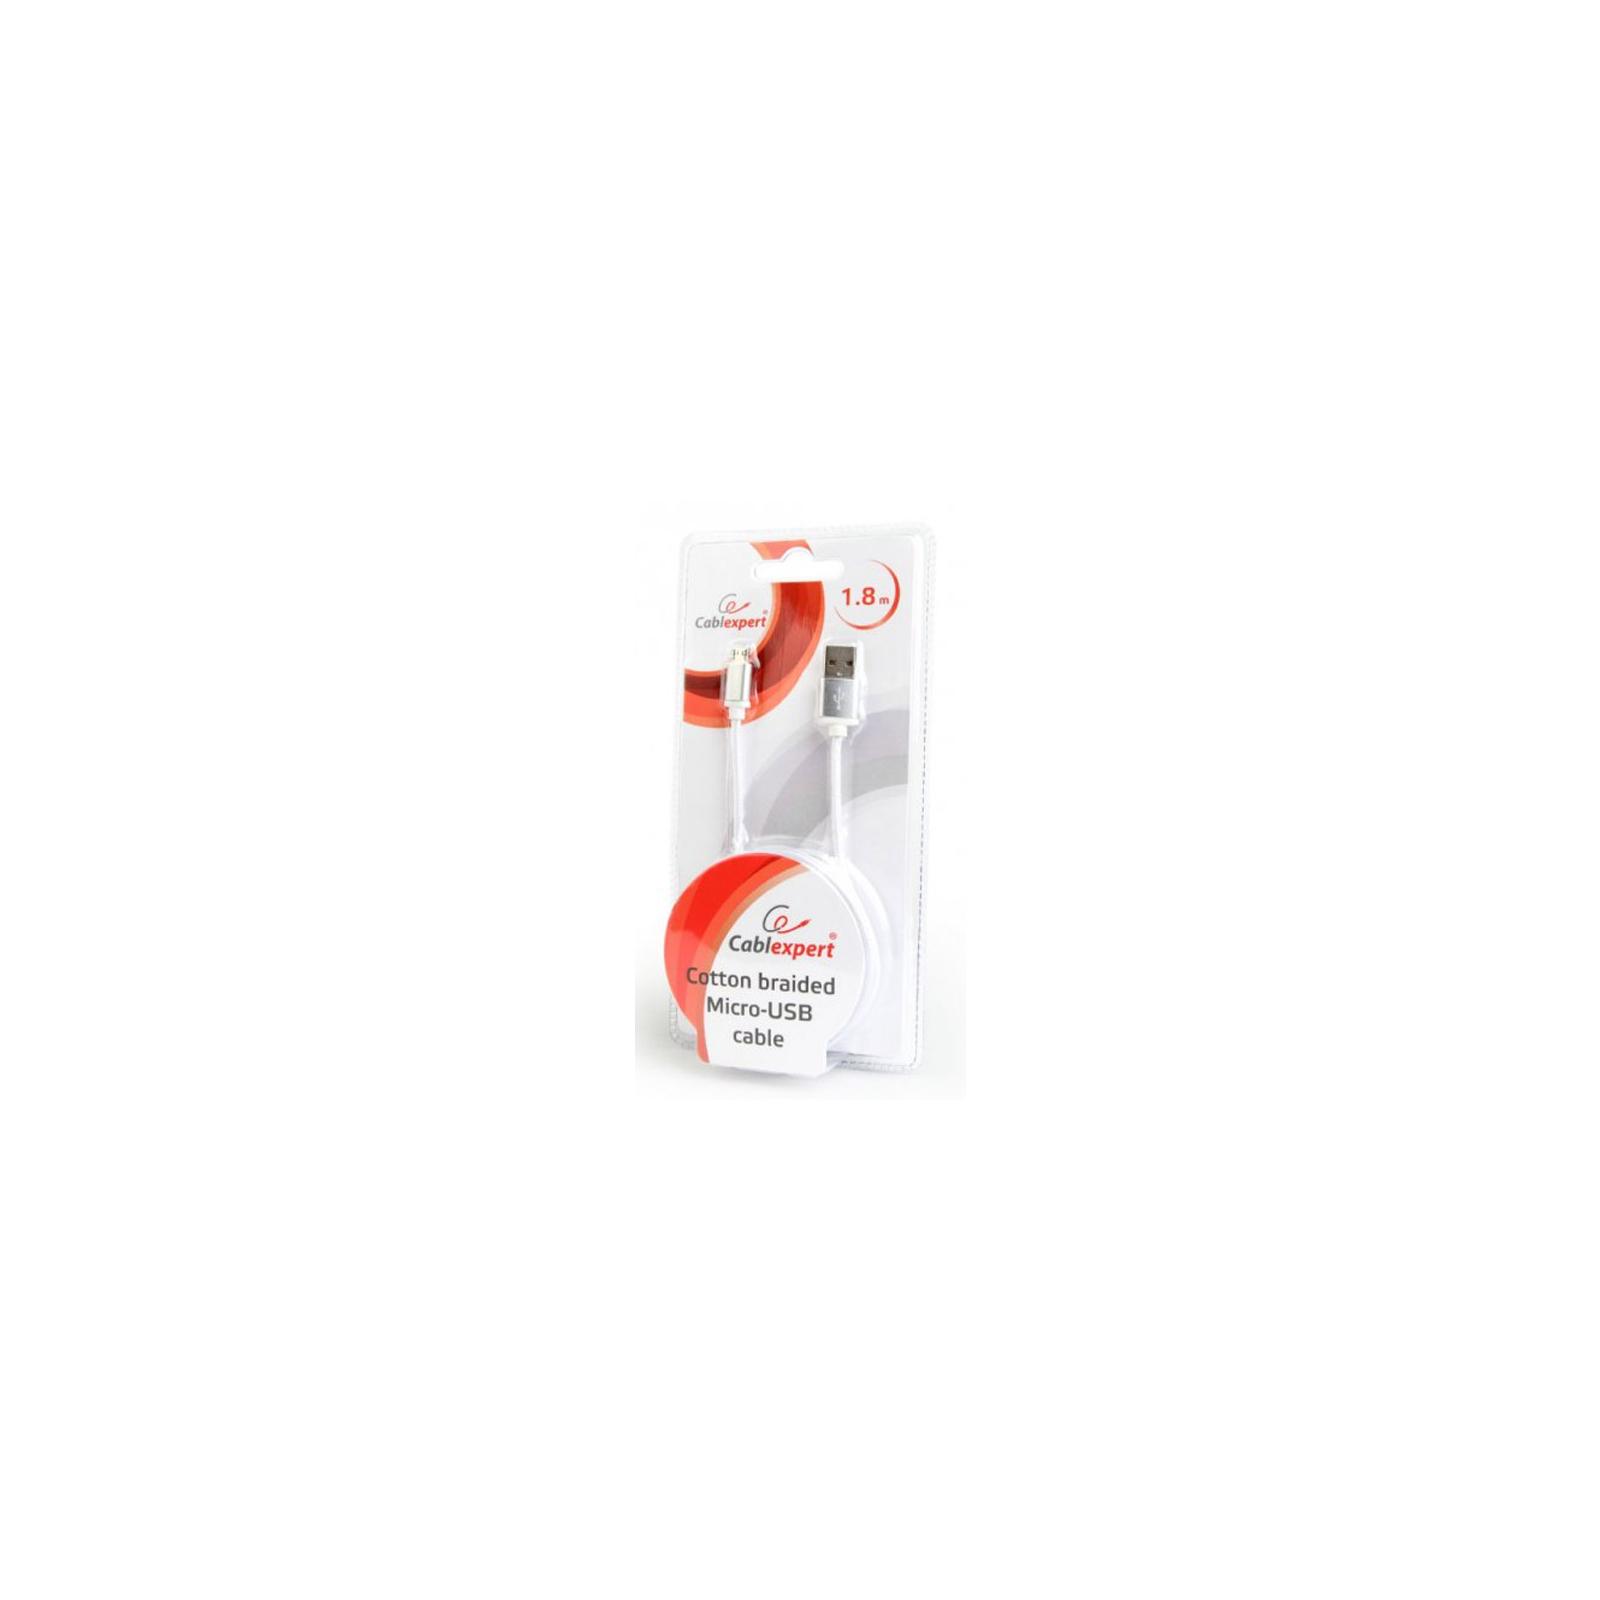 Дата кабель USB 2.0 AM to Micro 5P 1.8m Cablexpert (CCB-mUSB2B-AMBM-6-G) изображение 3